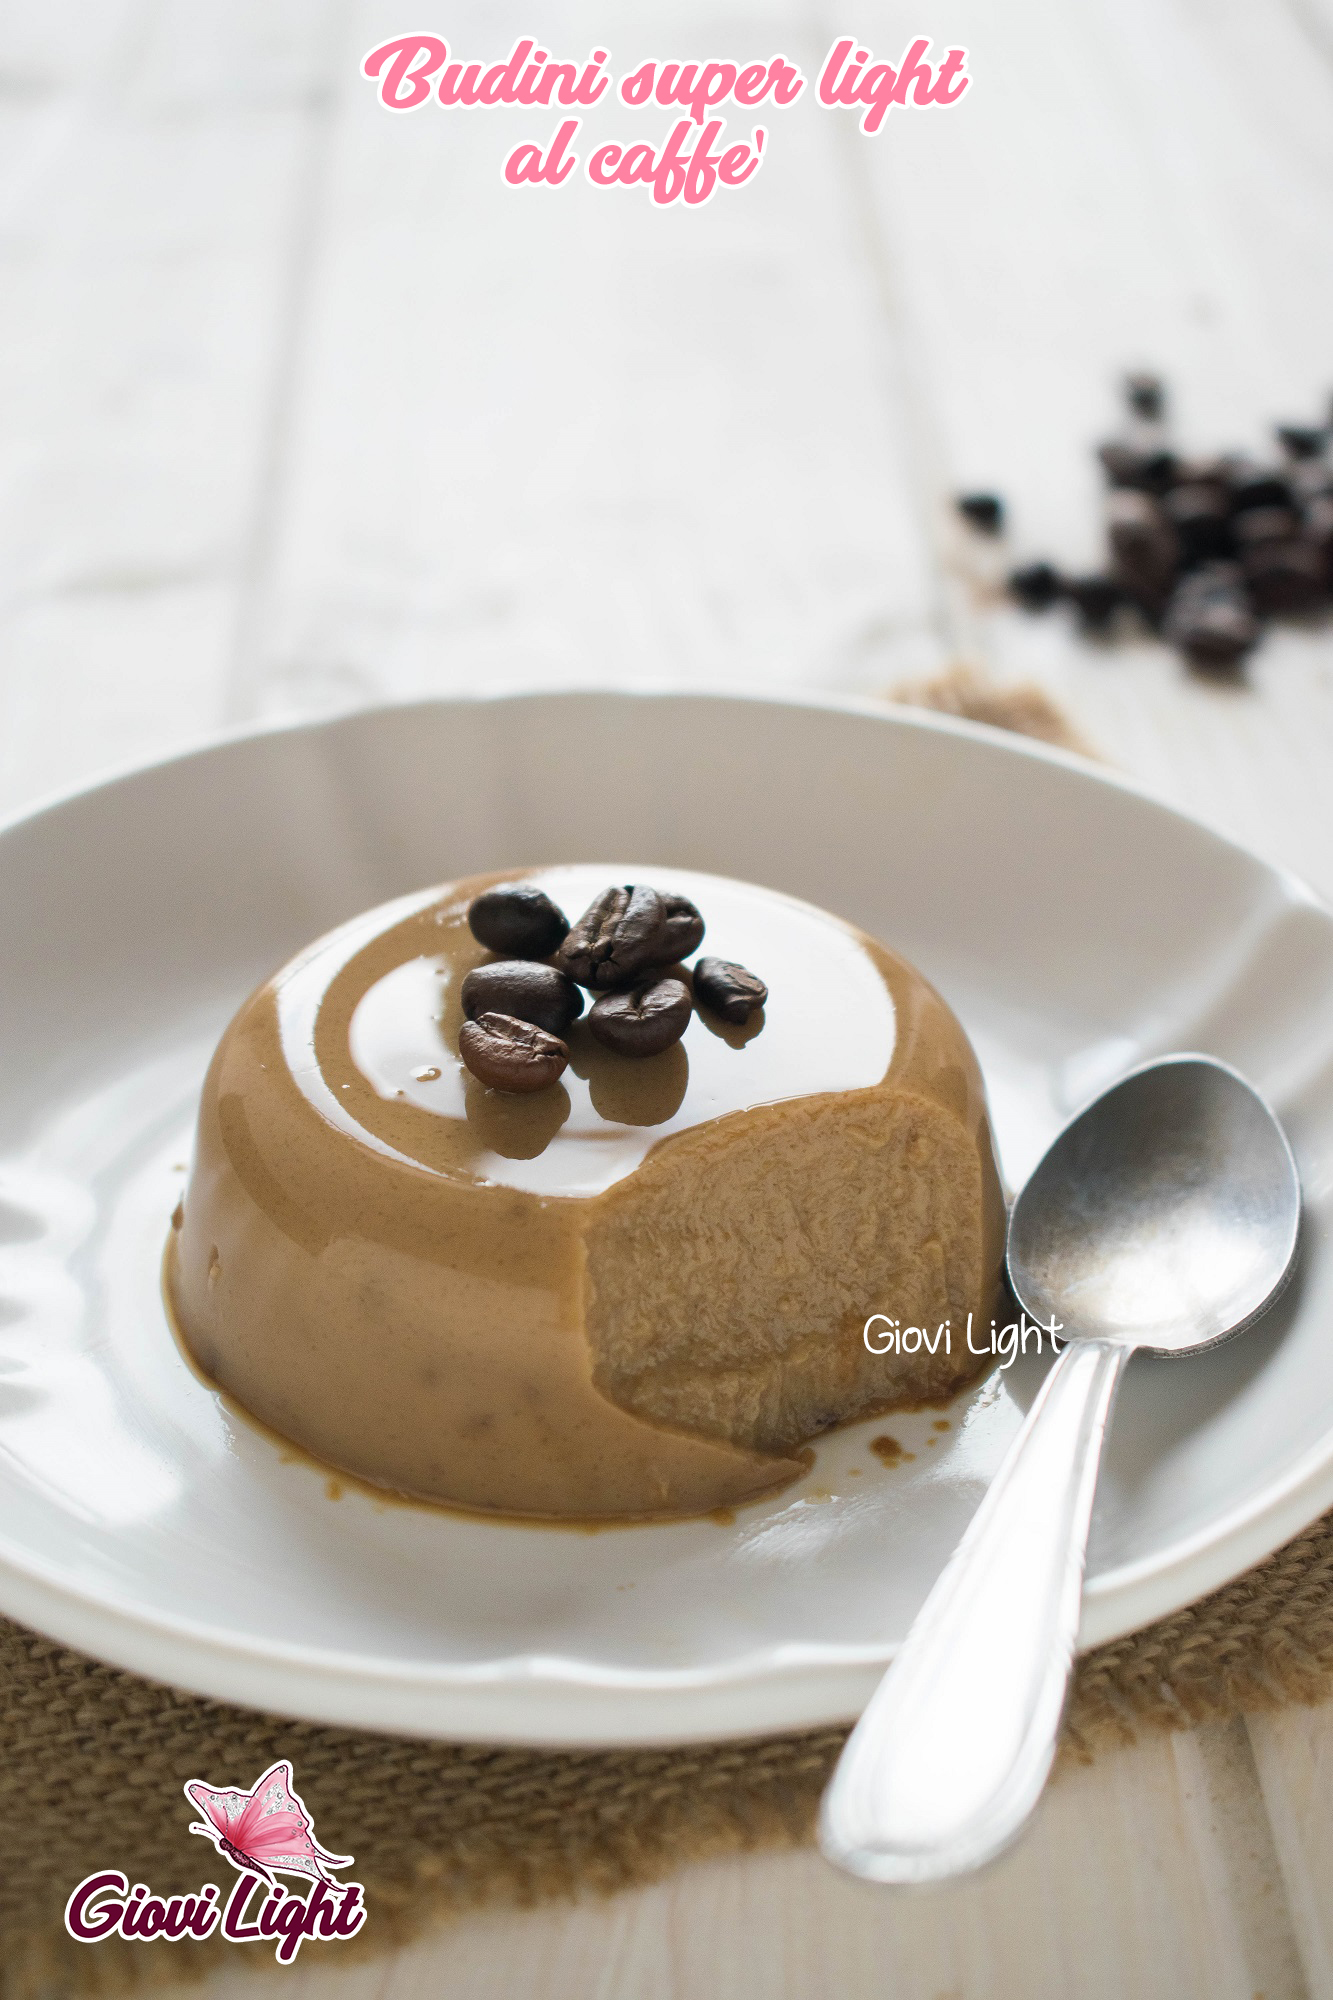 Budini super light al caffè - senza grassi, zucchero e a basso ig!